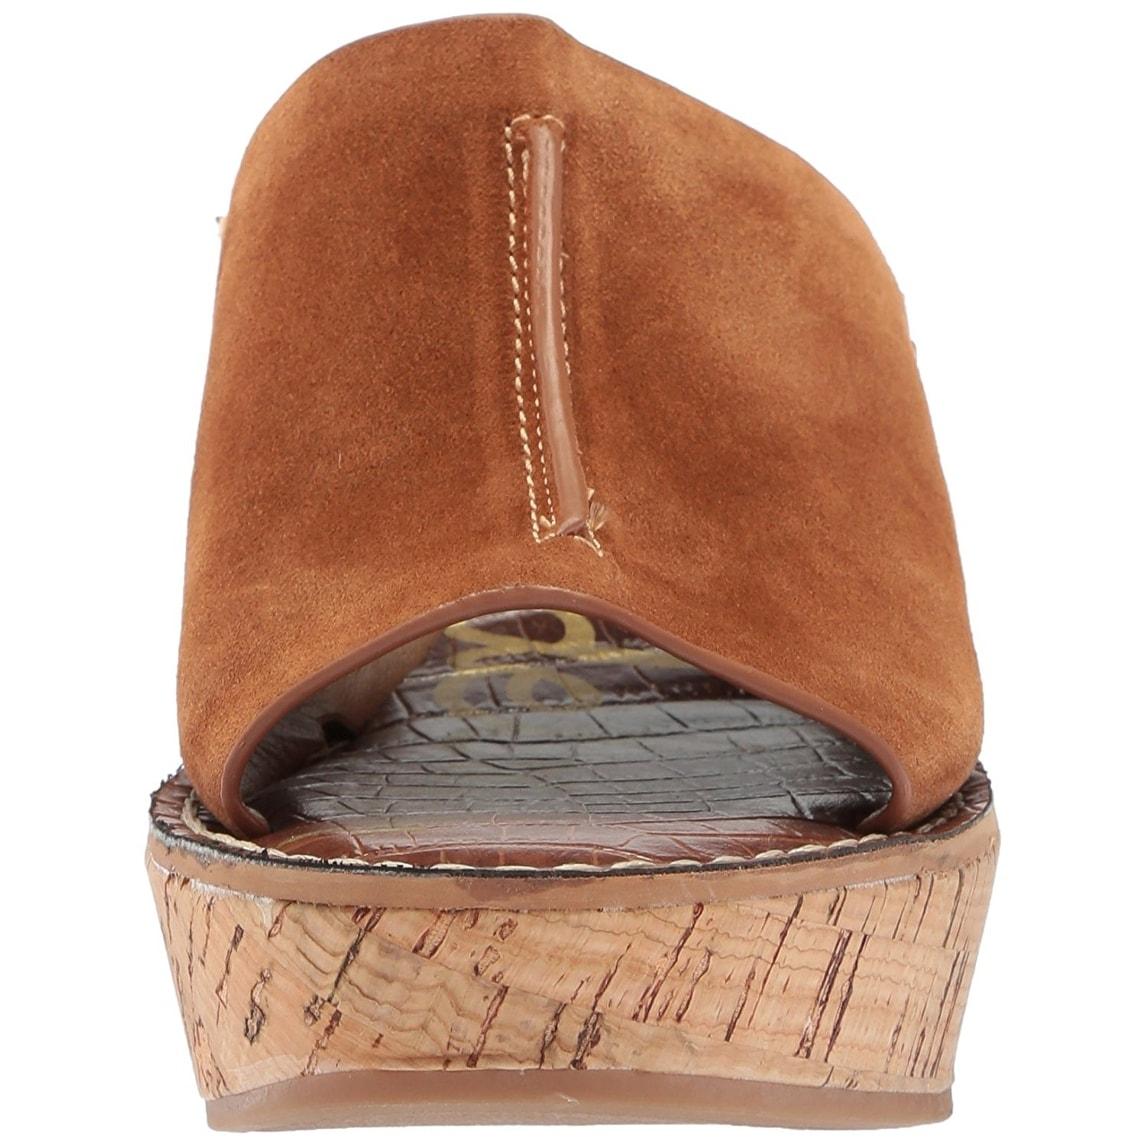 2269b0dfe74 Shop Sam Edelman Women s Ranger Wedge Sandal - 9.5 - Free Shipping Today -  Overstock - 21732187